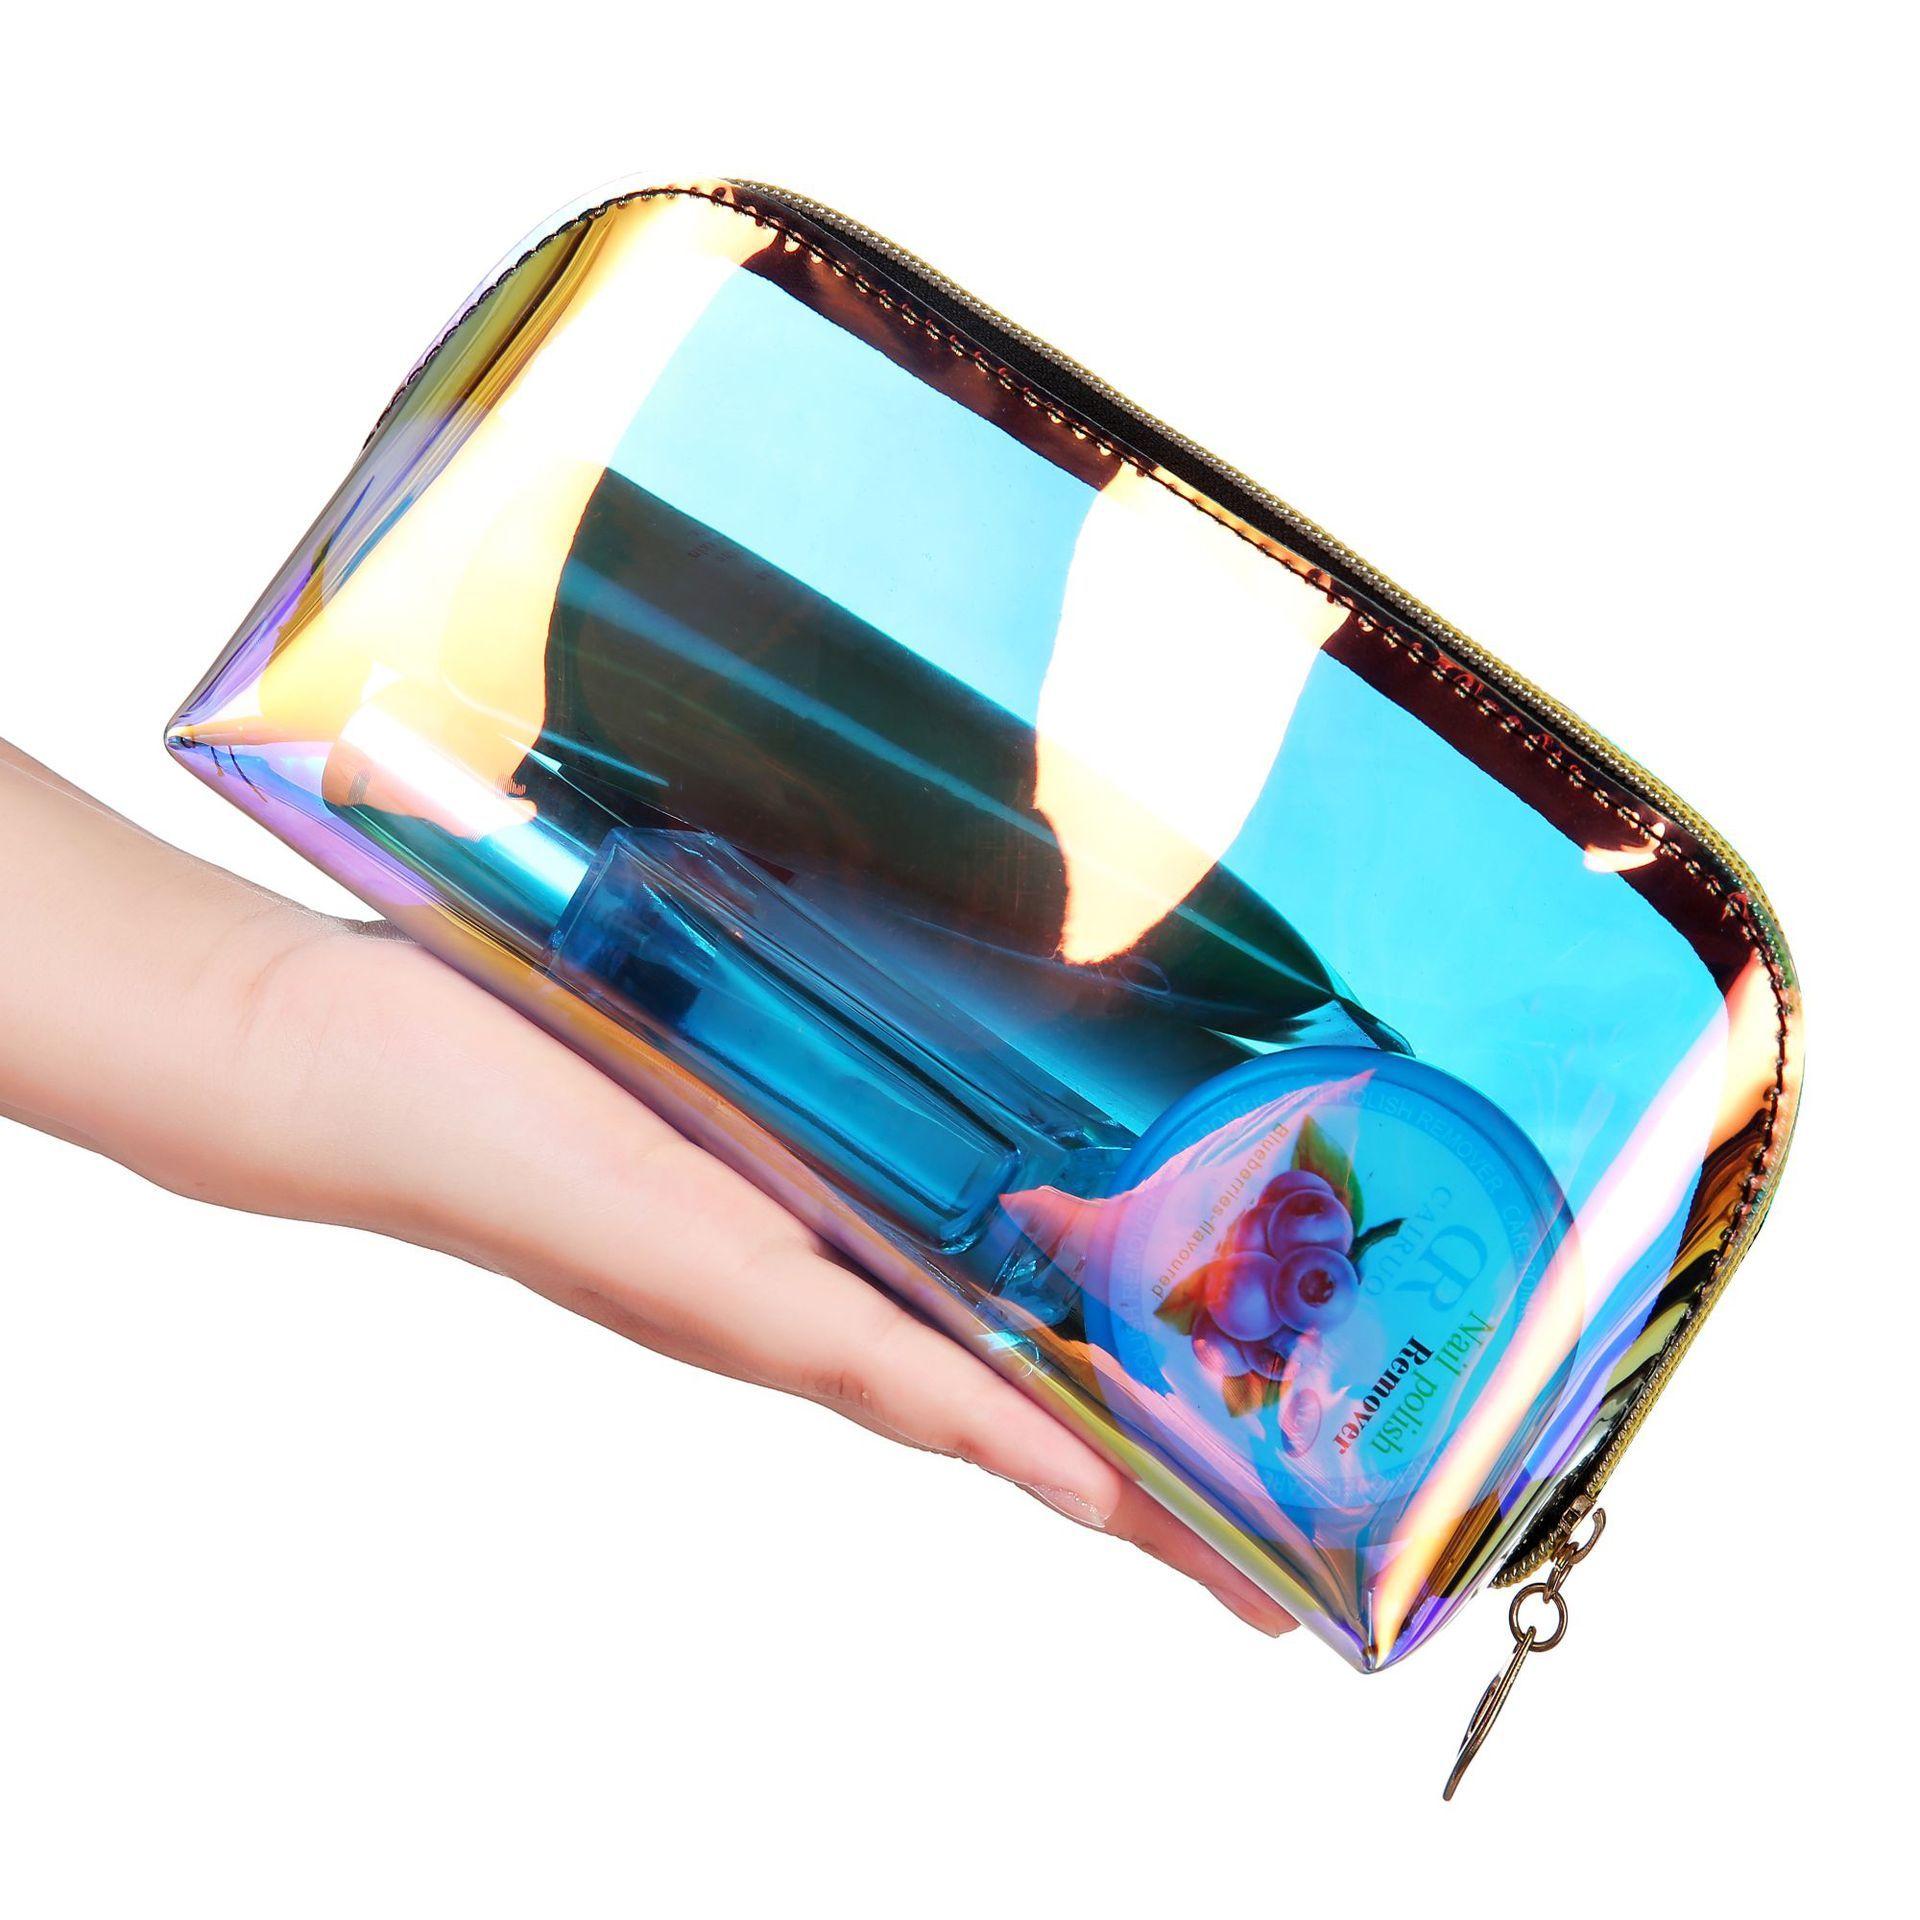 Bolsa de almacenamiento de cosméticos Transparente Bolsa de viaje impermeable organizador de maquillaje bolsas de aseo transparentes portátiles cierre de cremallera Bolsa Transparente